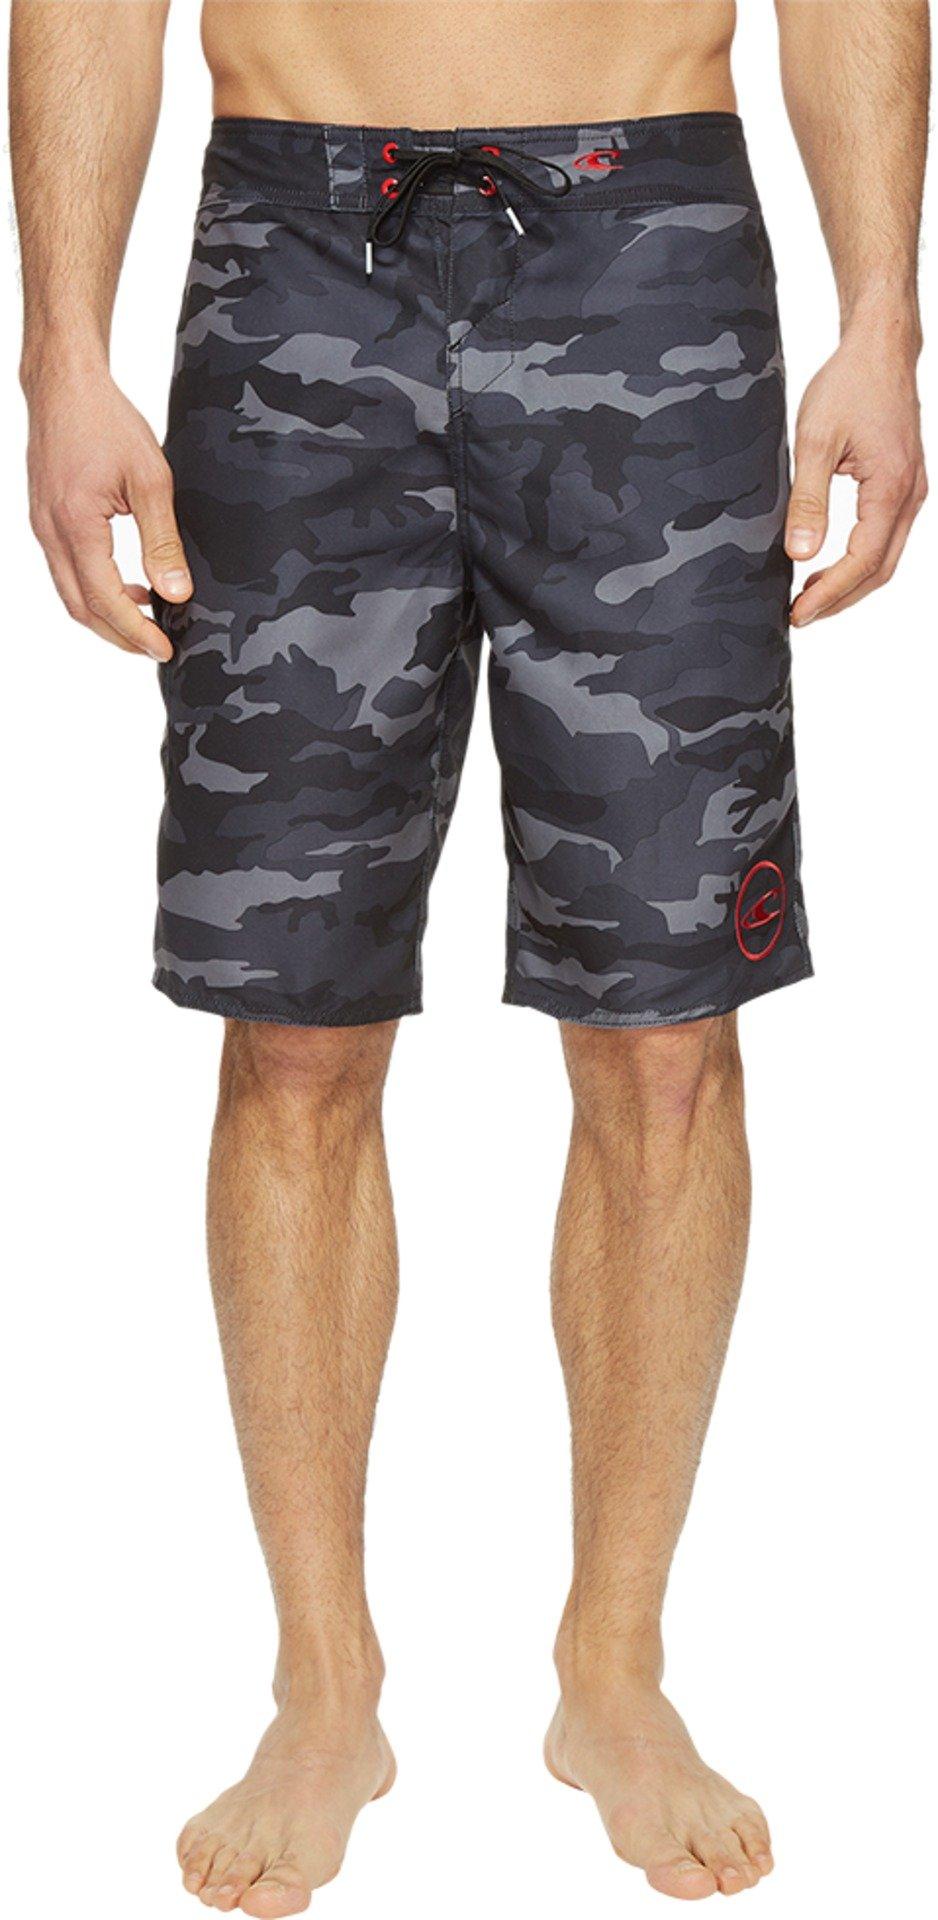 O'Neill Men's Santa Cruz Printed Boardshorts Black Camo Swimsuit Bottoms